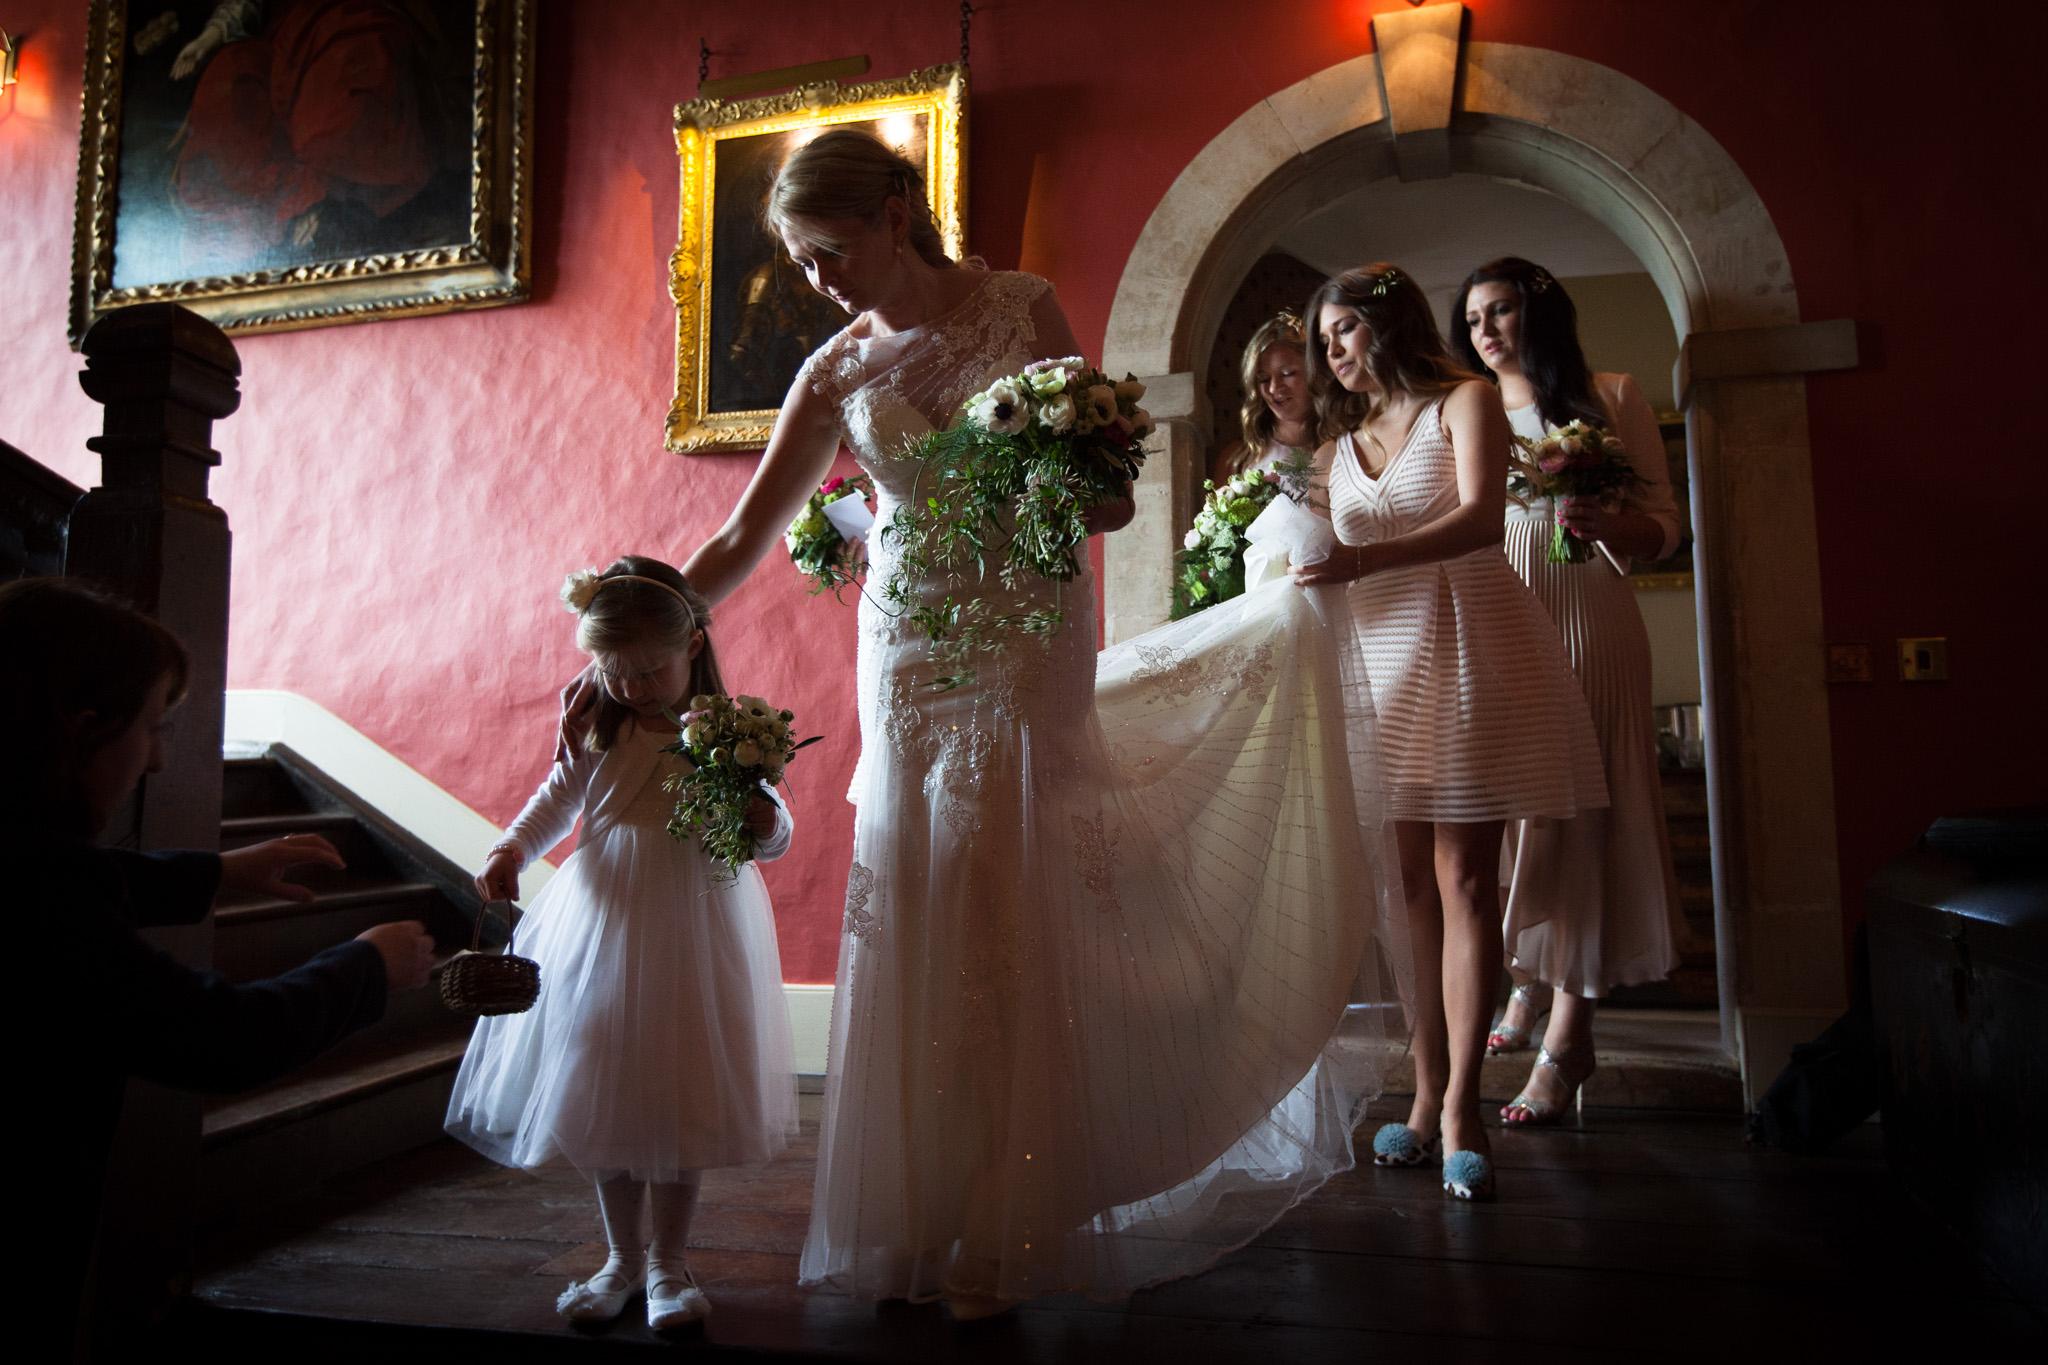 Mark_Barnes_Gloucester_Wedding_Photographer_Elmore_Court_Wedding_Photography_Mike+Kelly-27.jpg